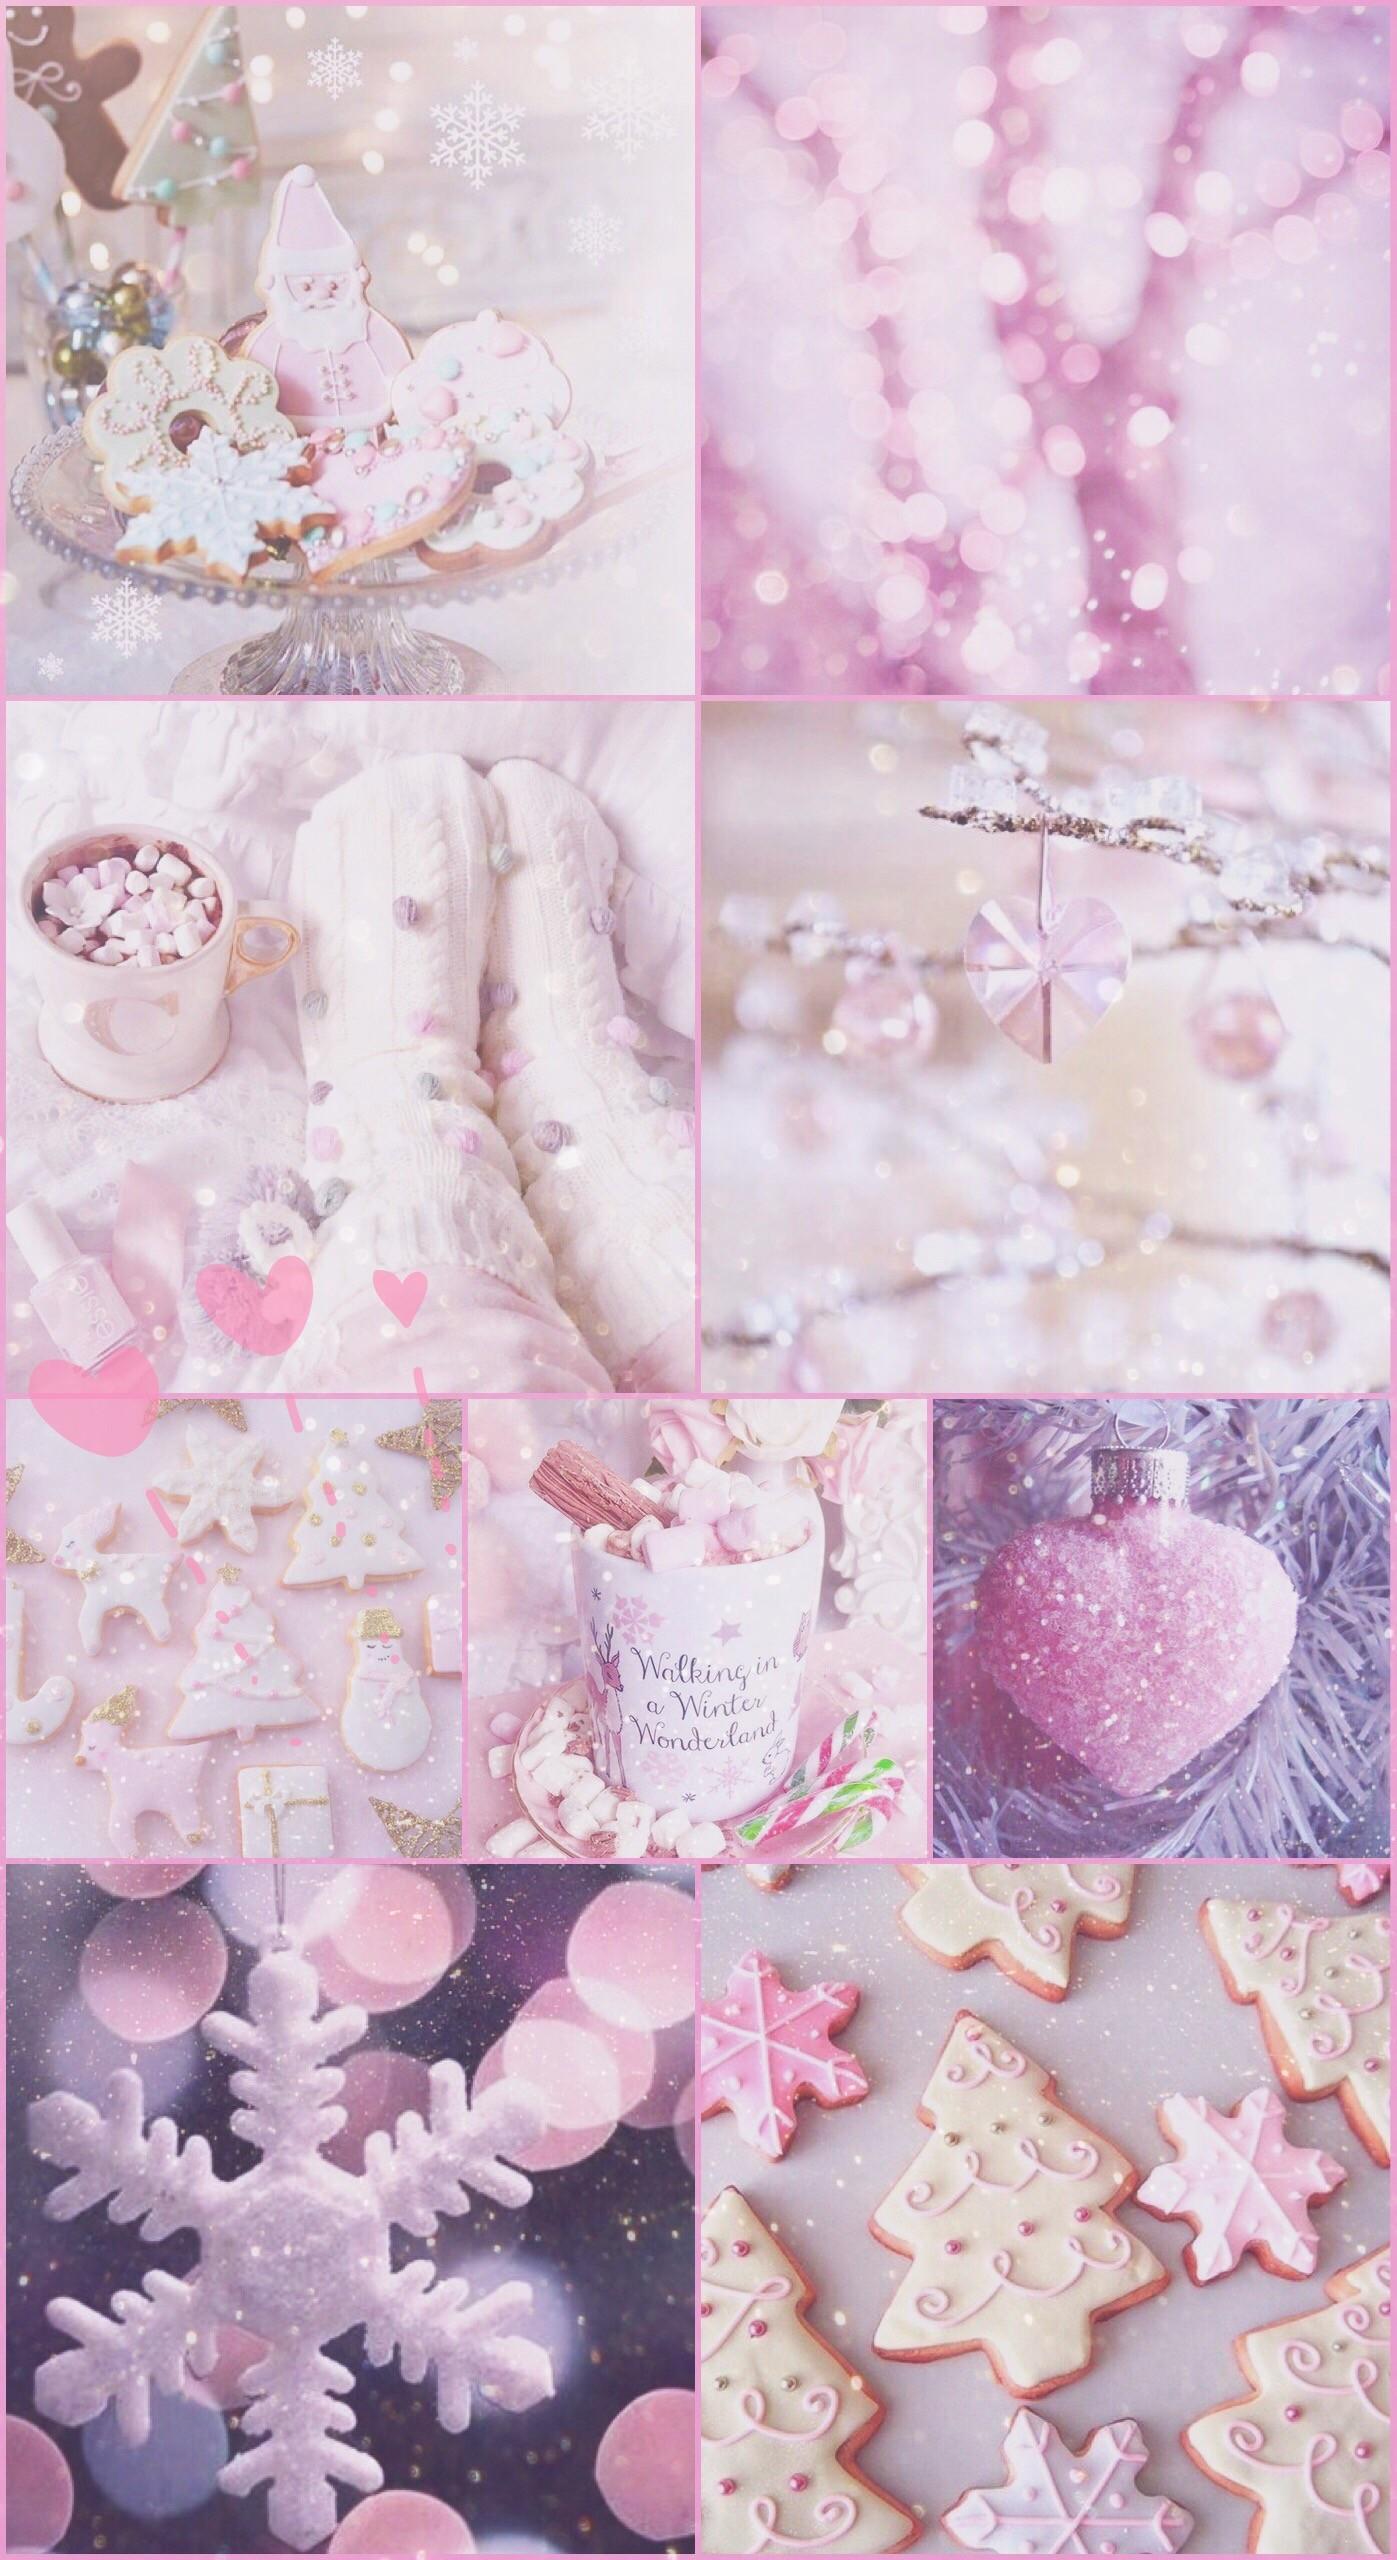 78 785908 xmas christmas pink pretty sparkly glitter white wallpaper